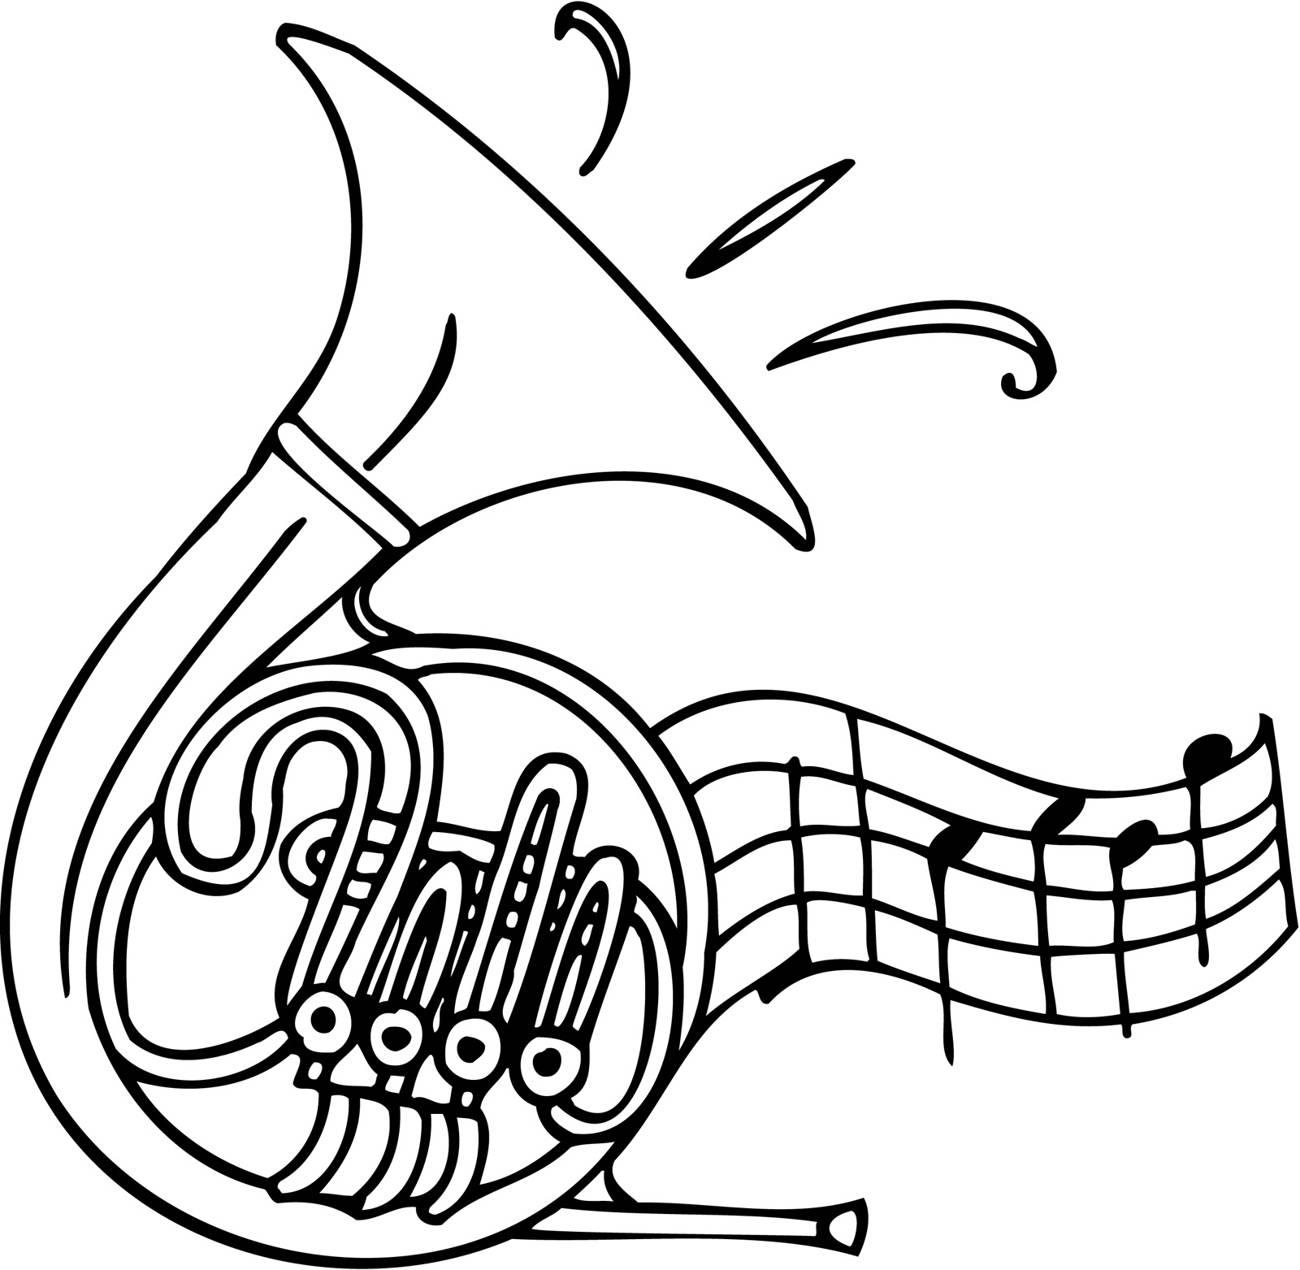 MUSIC-061